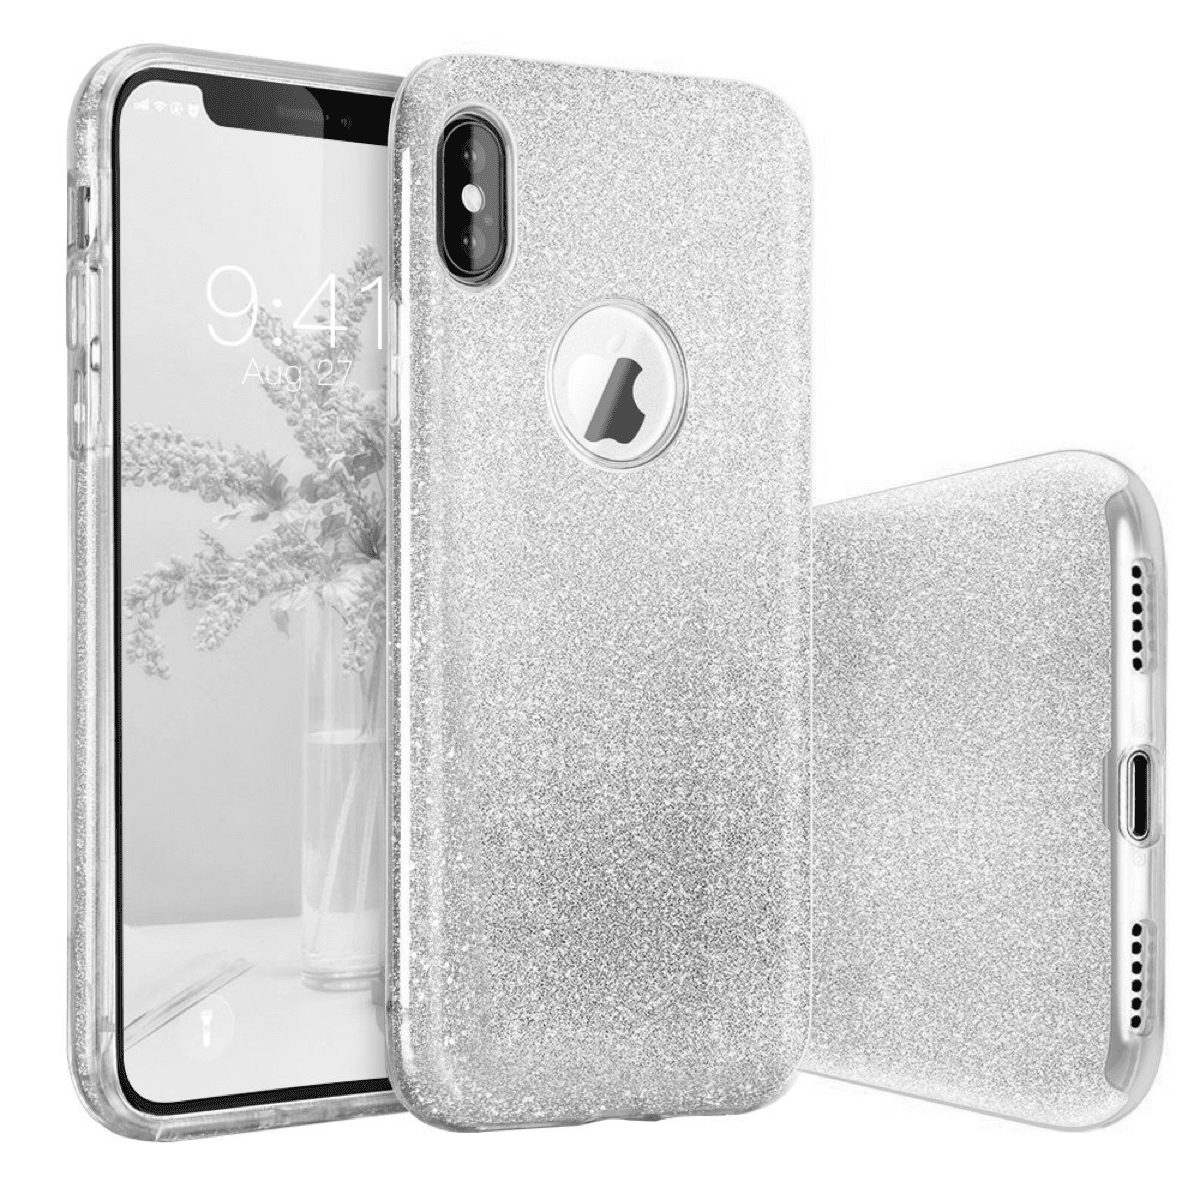 Basstop glitter iPhone X bling cases